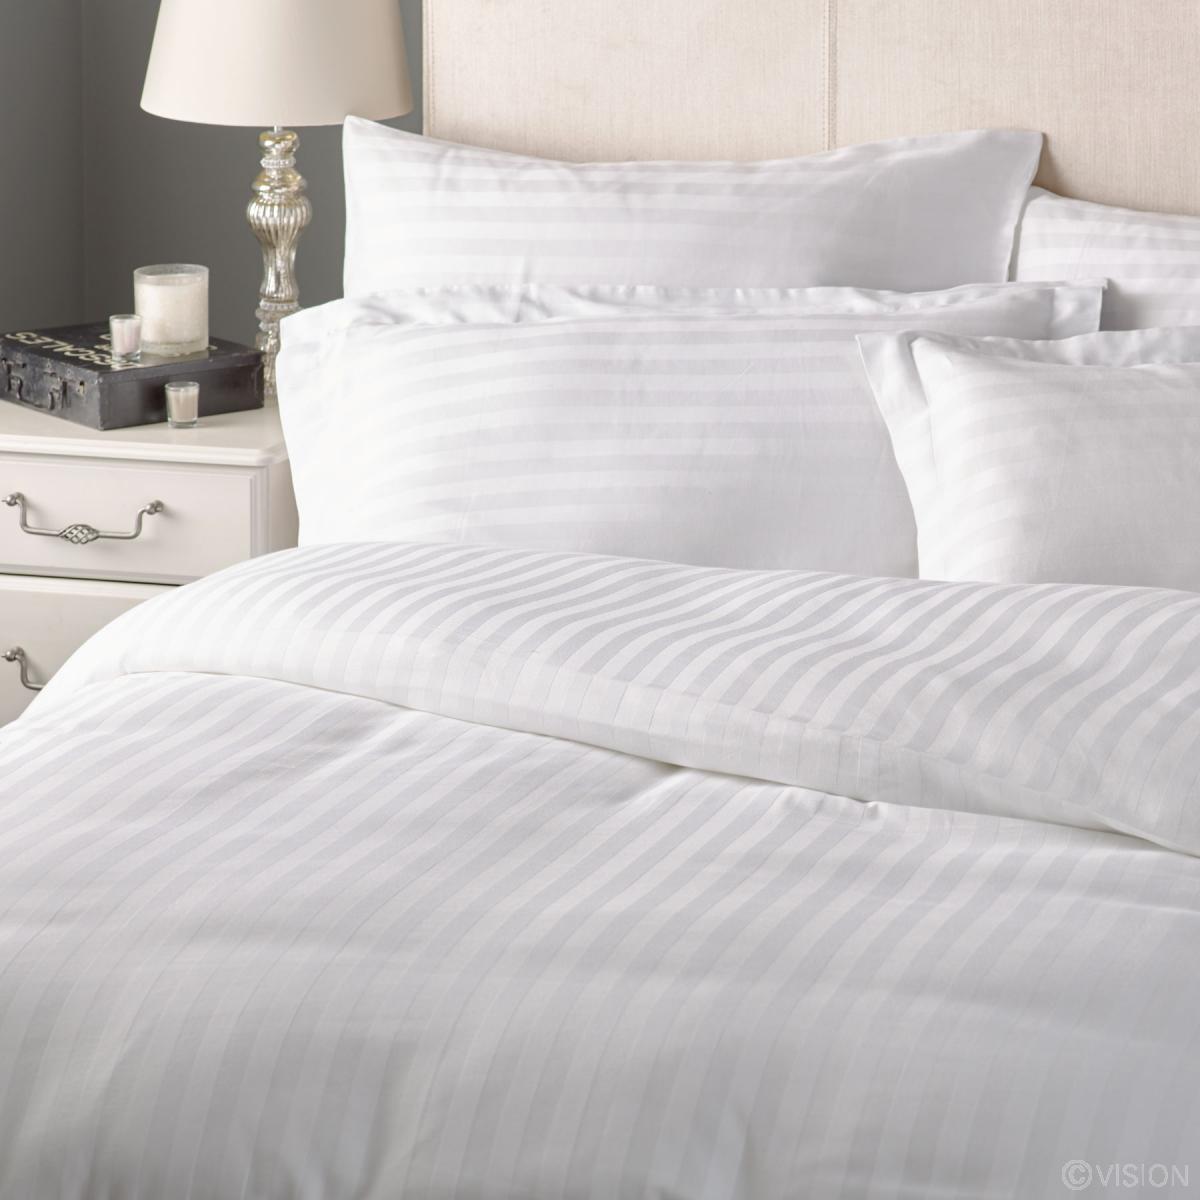 Superior Satin Stripe Bedding Duvet Cover Luxury Bed